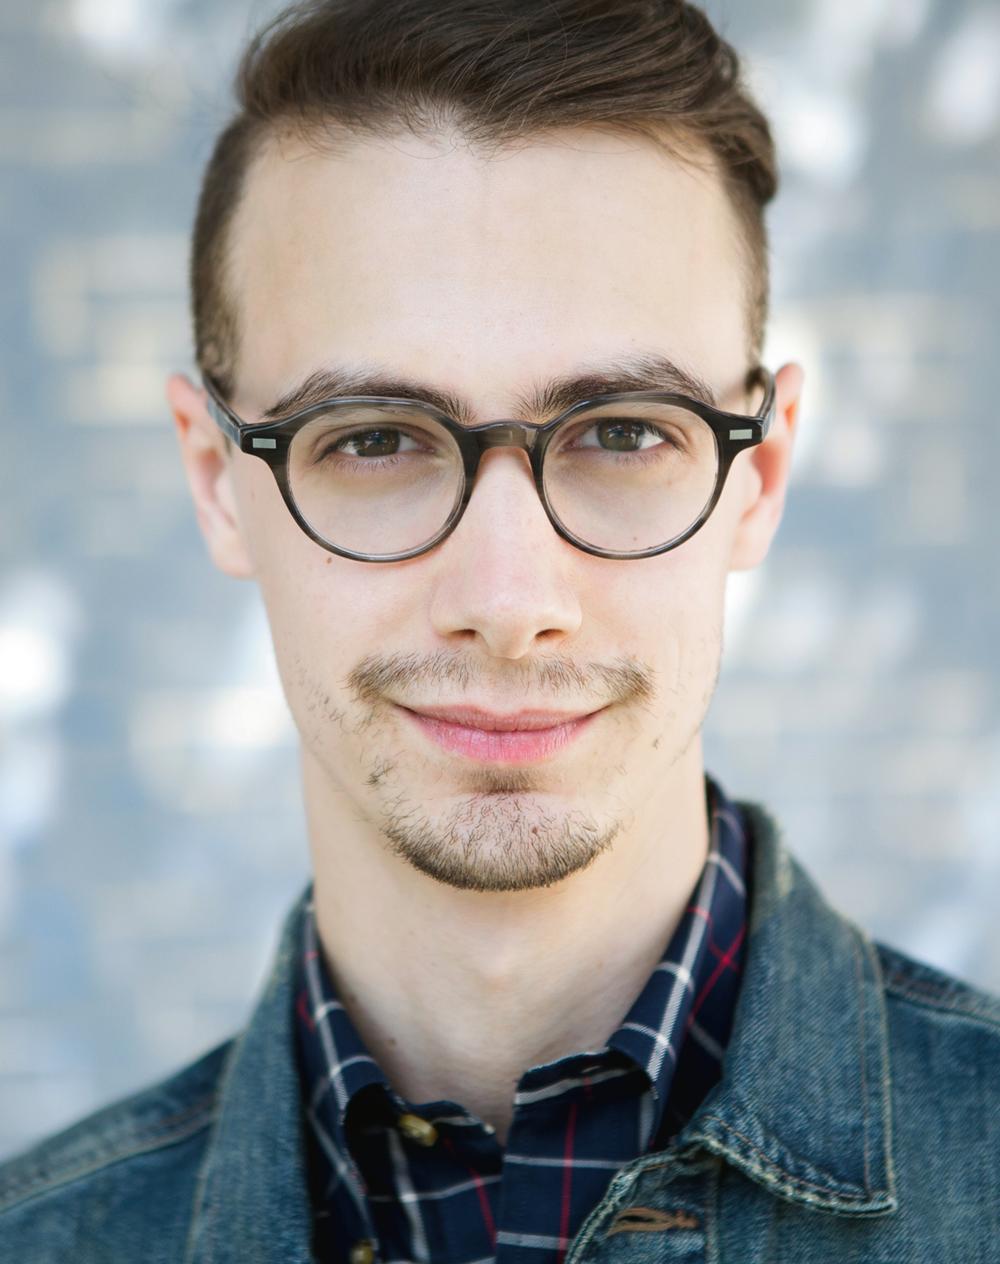 Nicholas Smerkanich